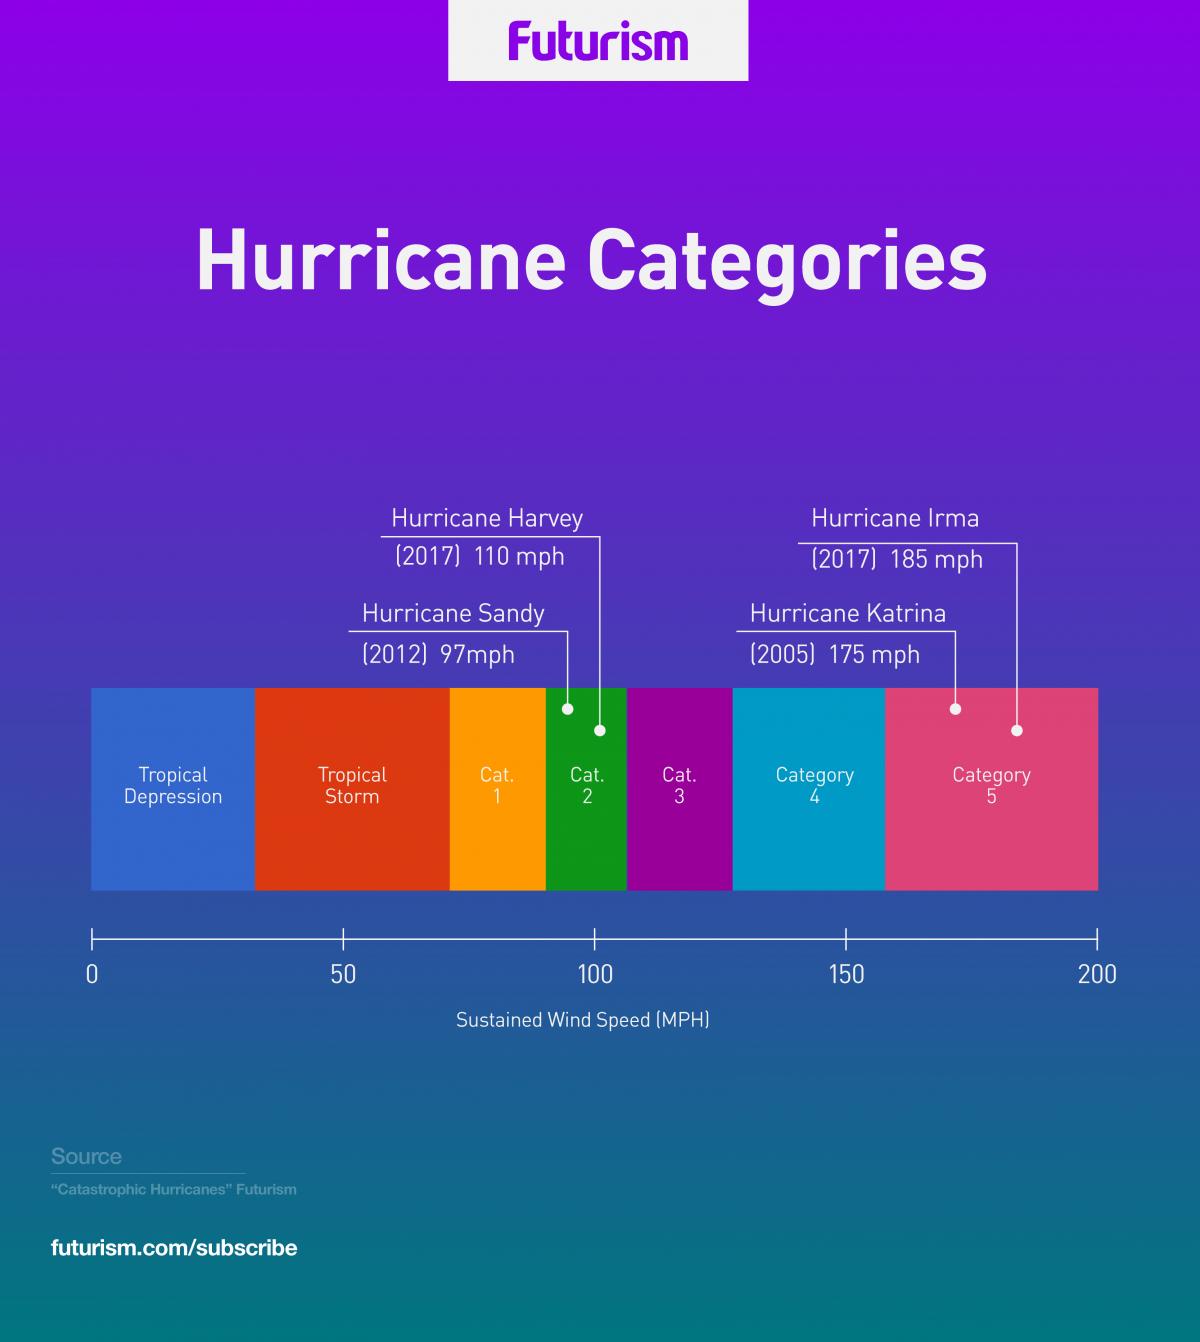 Texas Louisiana Begin Long Recovery From Catastrophic Flooding As The Remnants Of Hurricane Harvey Move Northeast Atlantic Hurricane Hurricane Season Hurricane